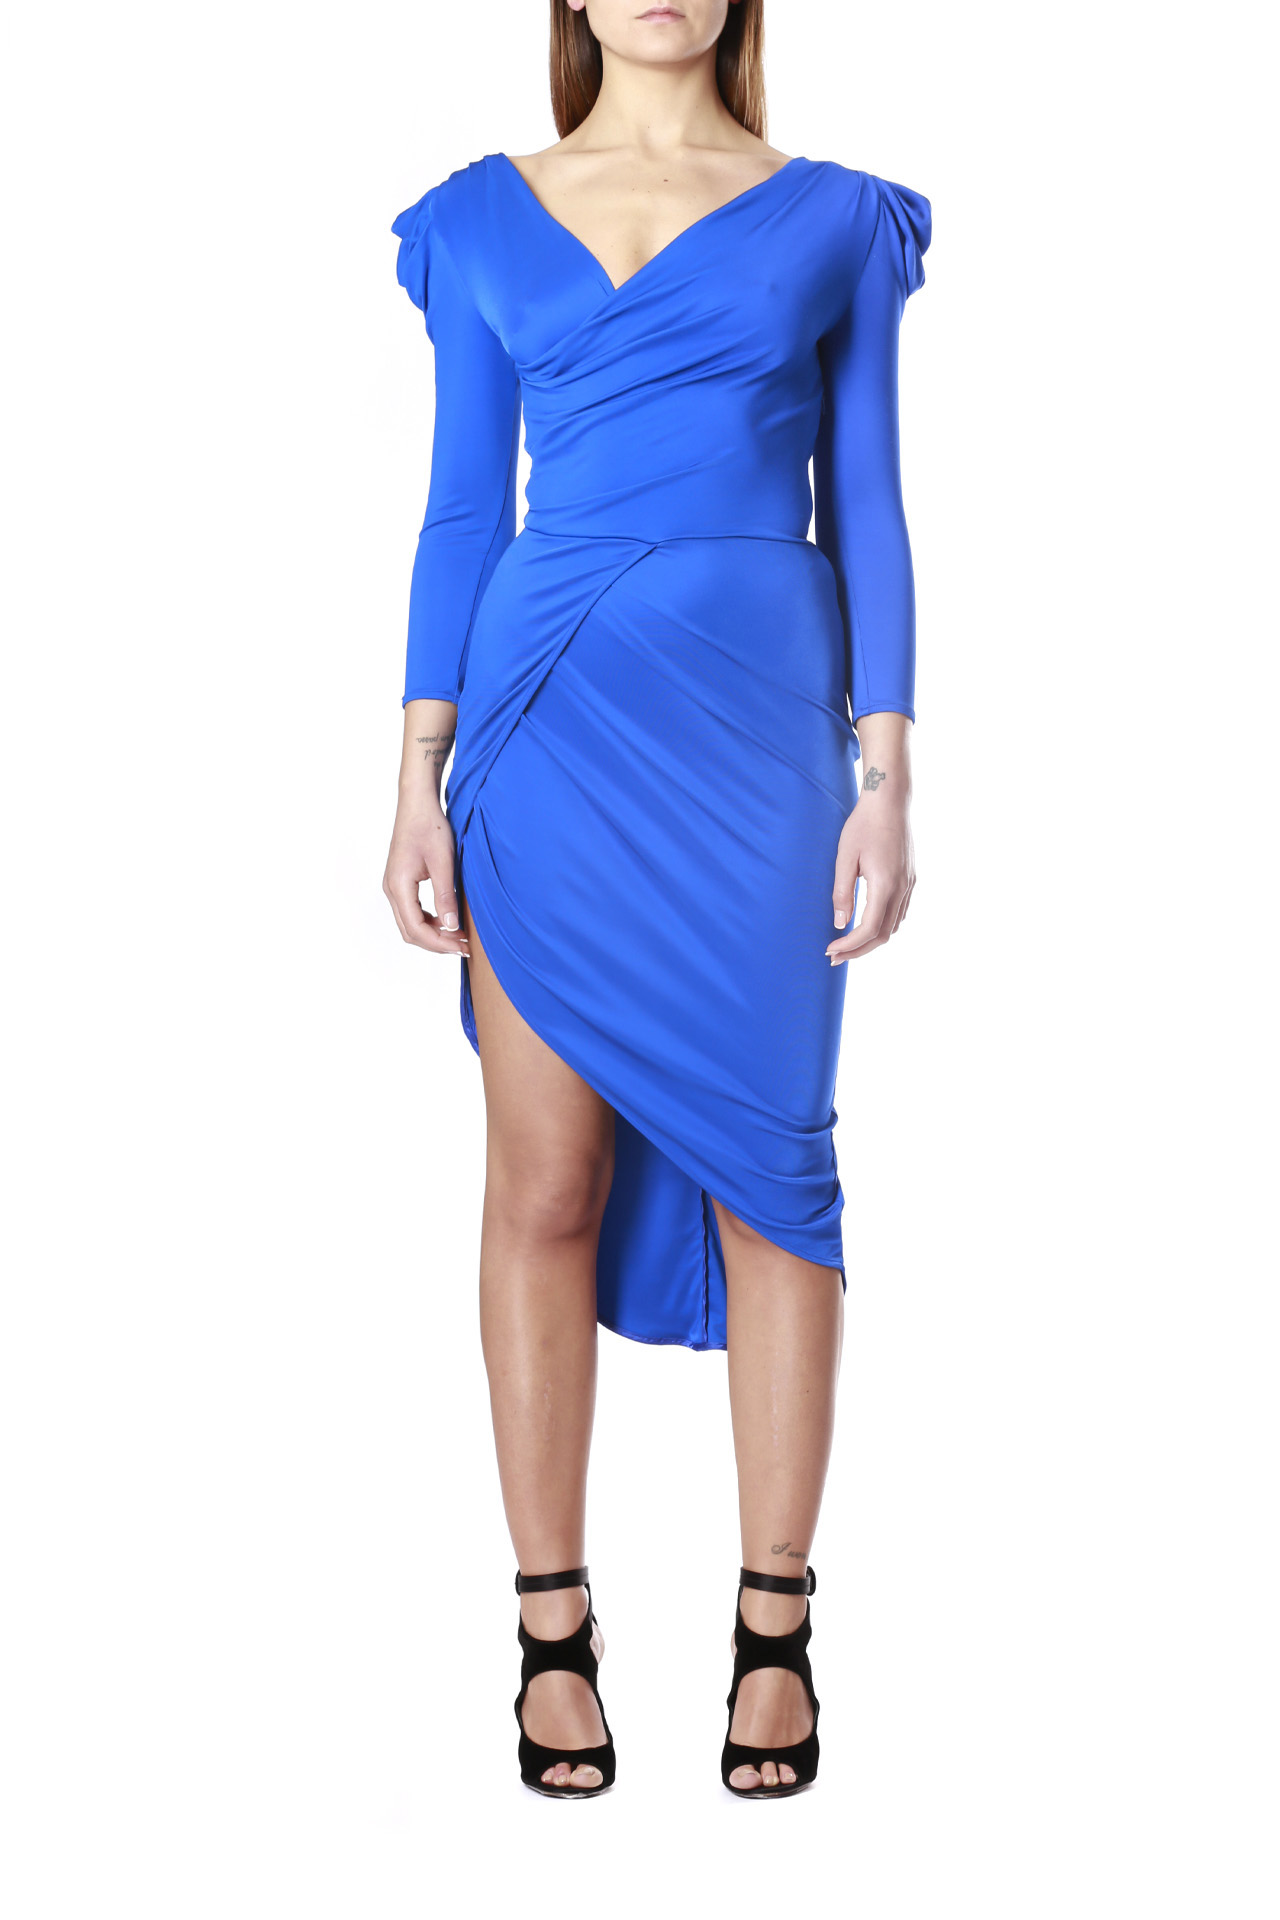 ELISABETTA FRANCHI | Dress | AB17401E2565